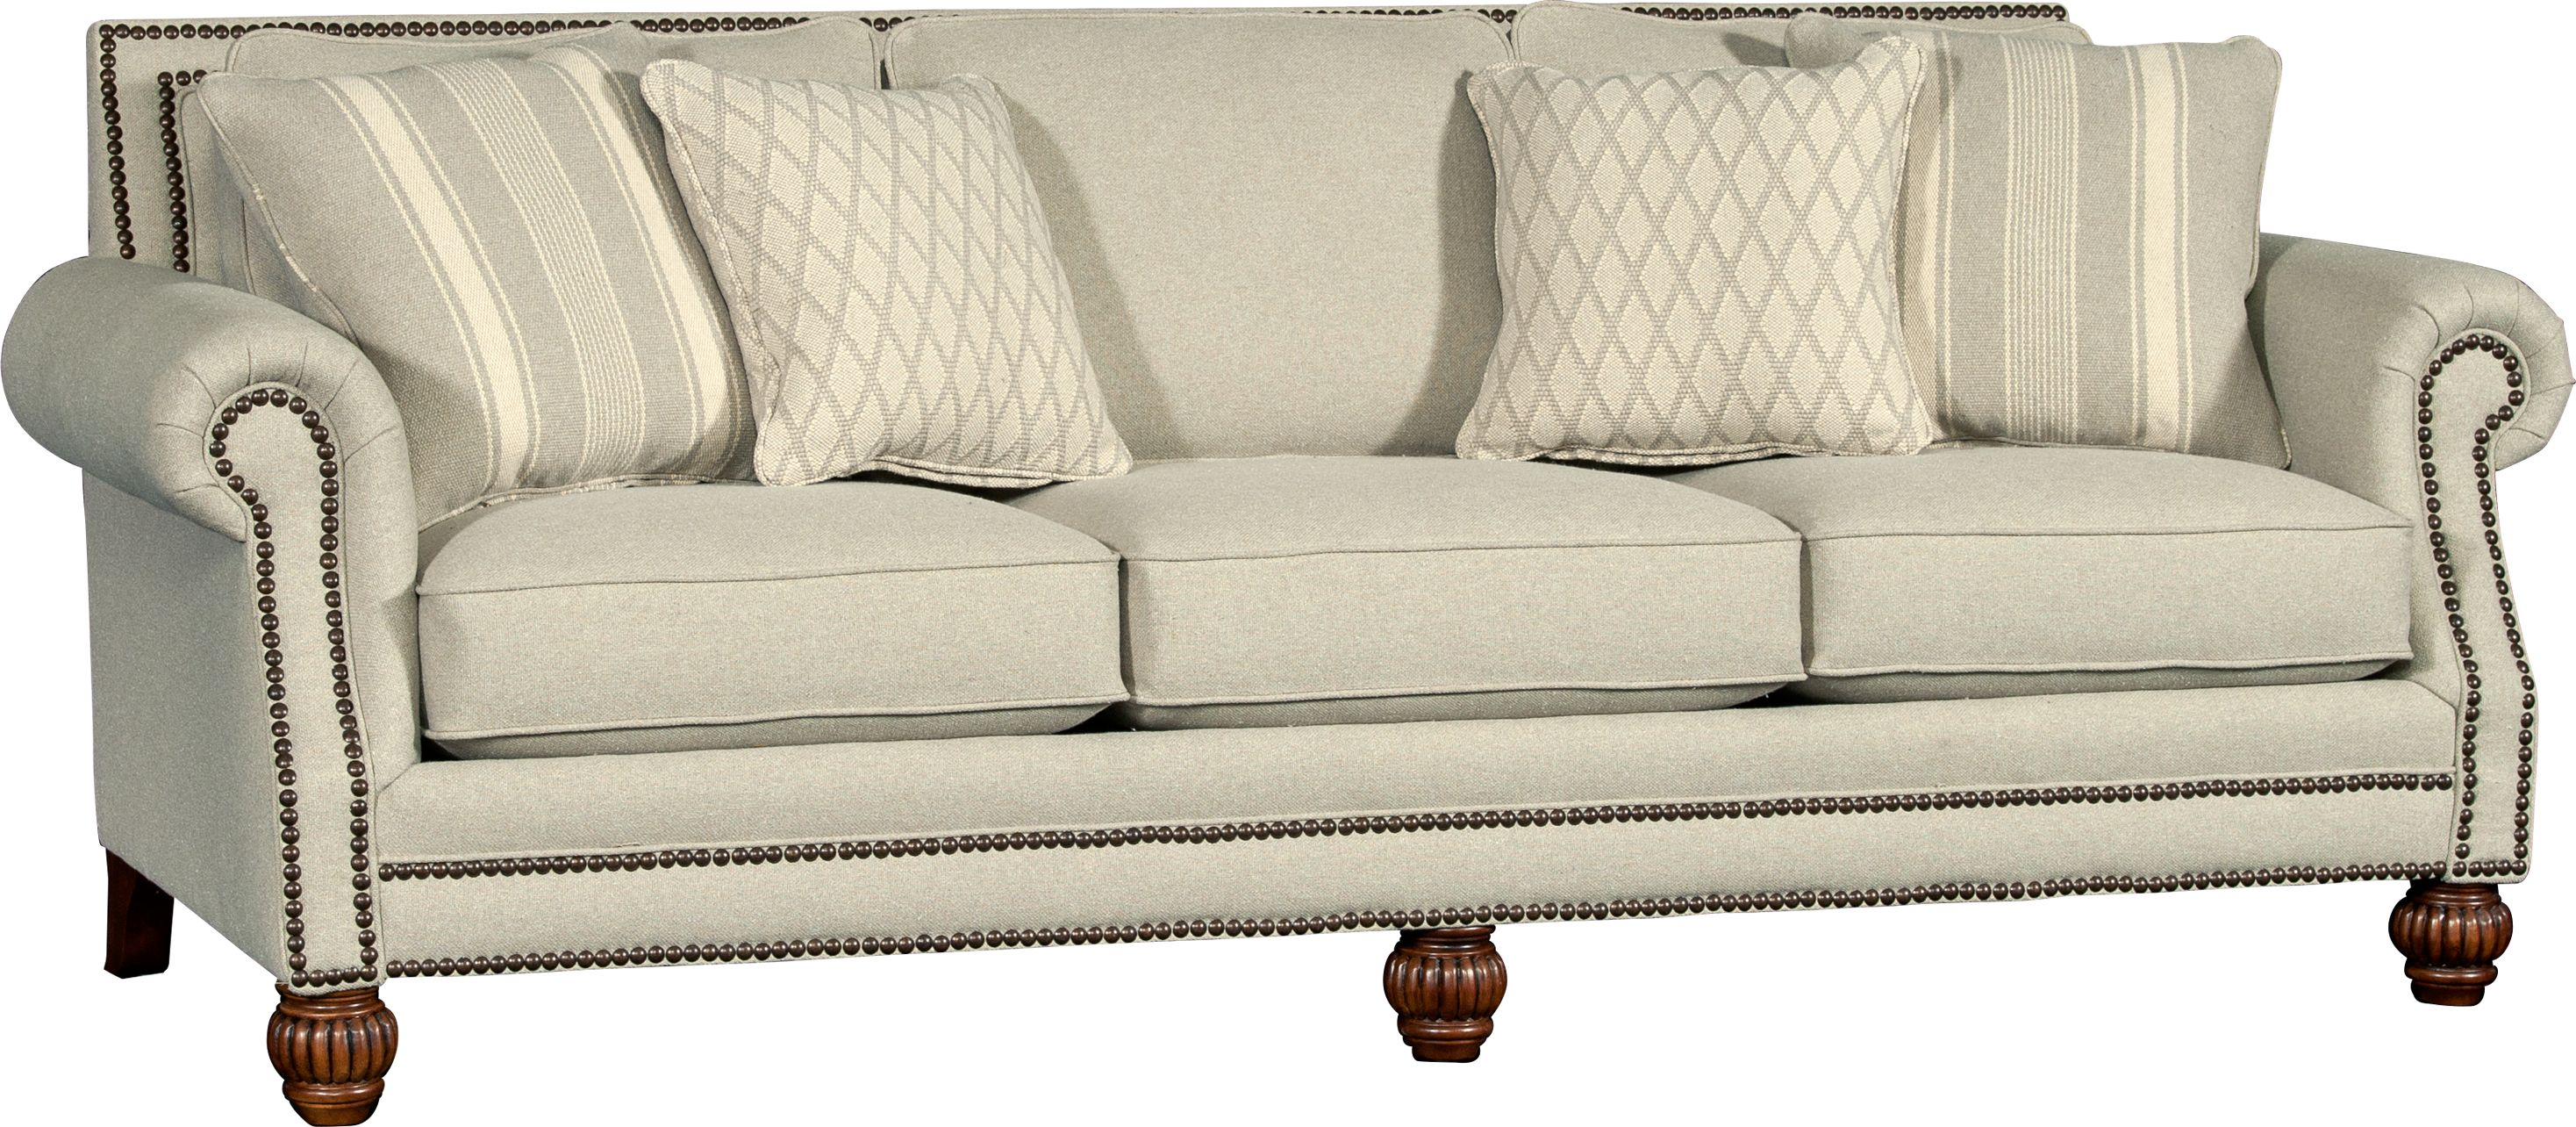 Mayo Furniture 7240F Fabric Sofa Madeline Glacier